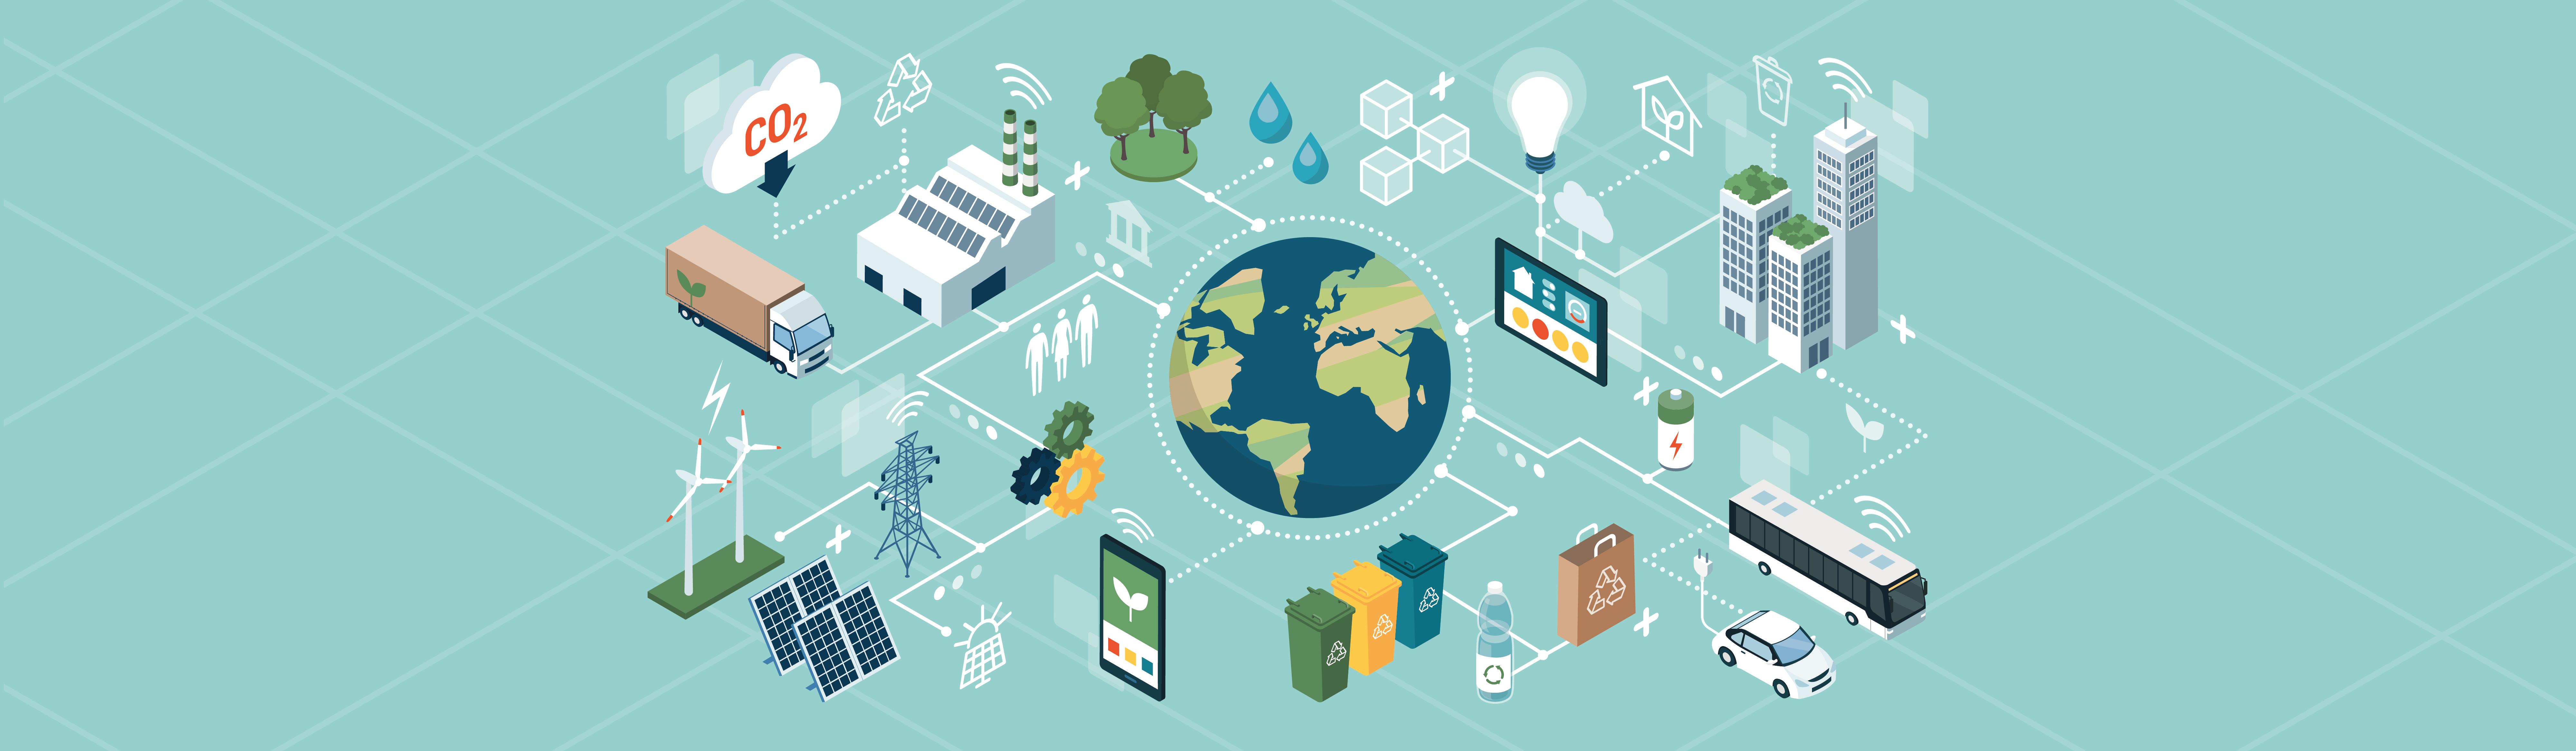 Consumo sustentabilidade banner plataforma